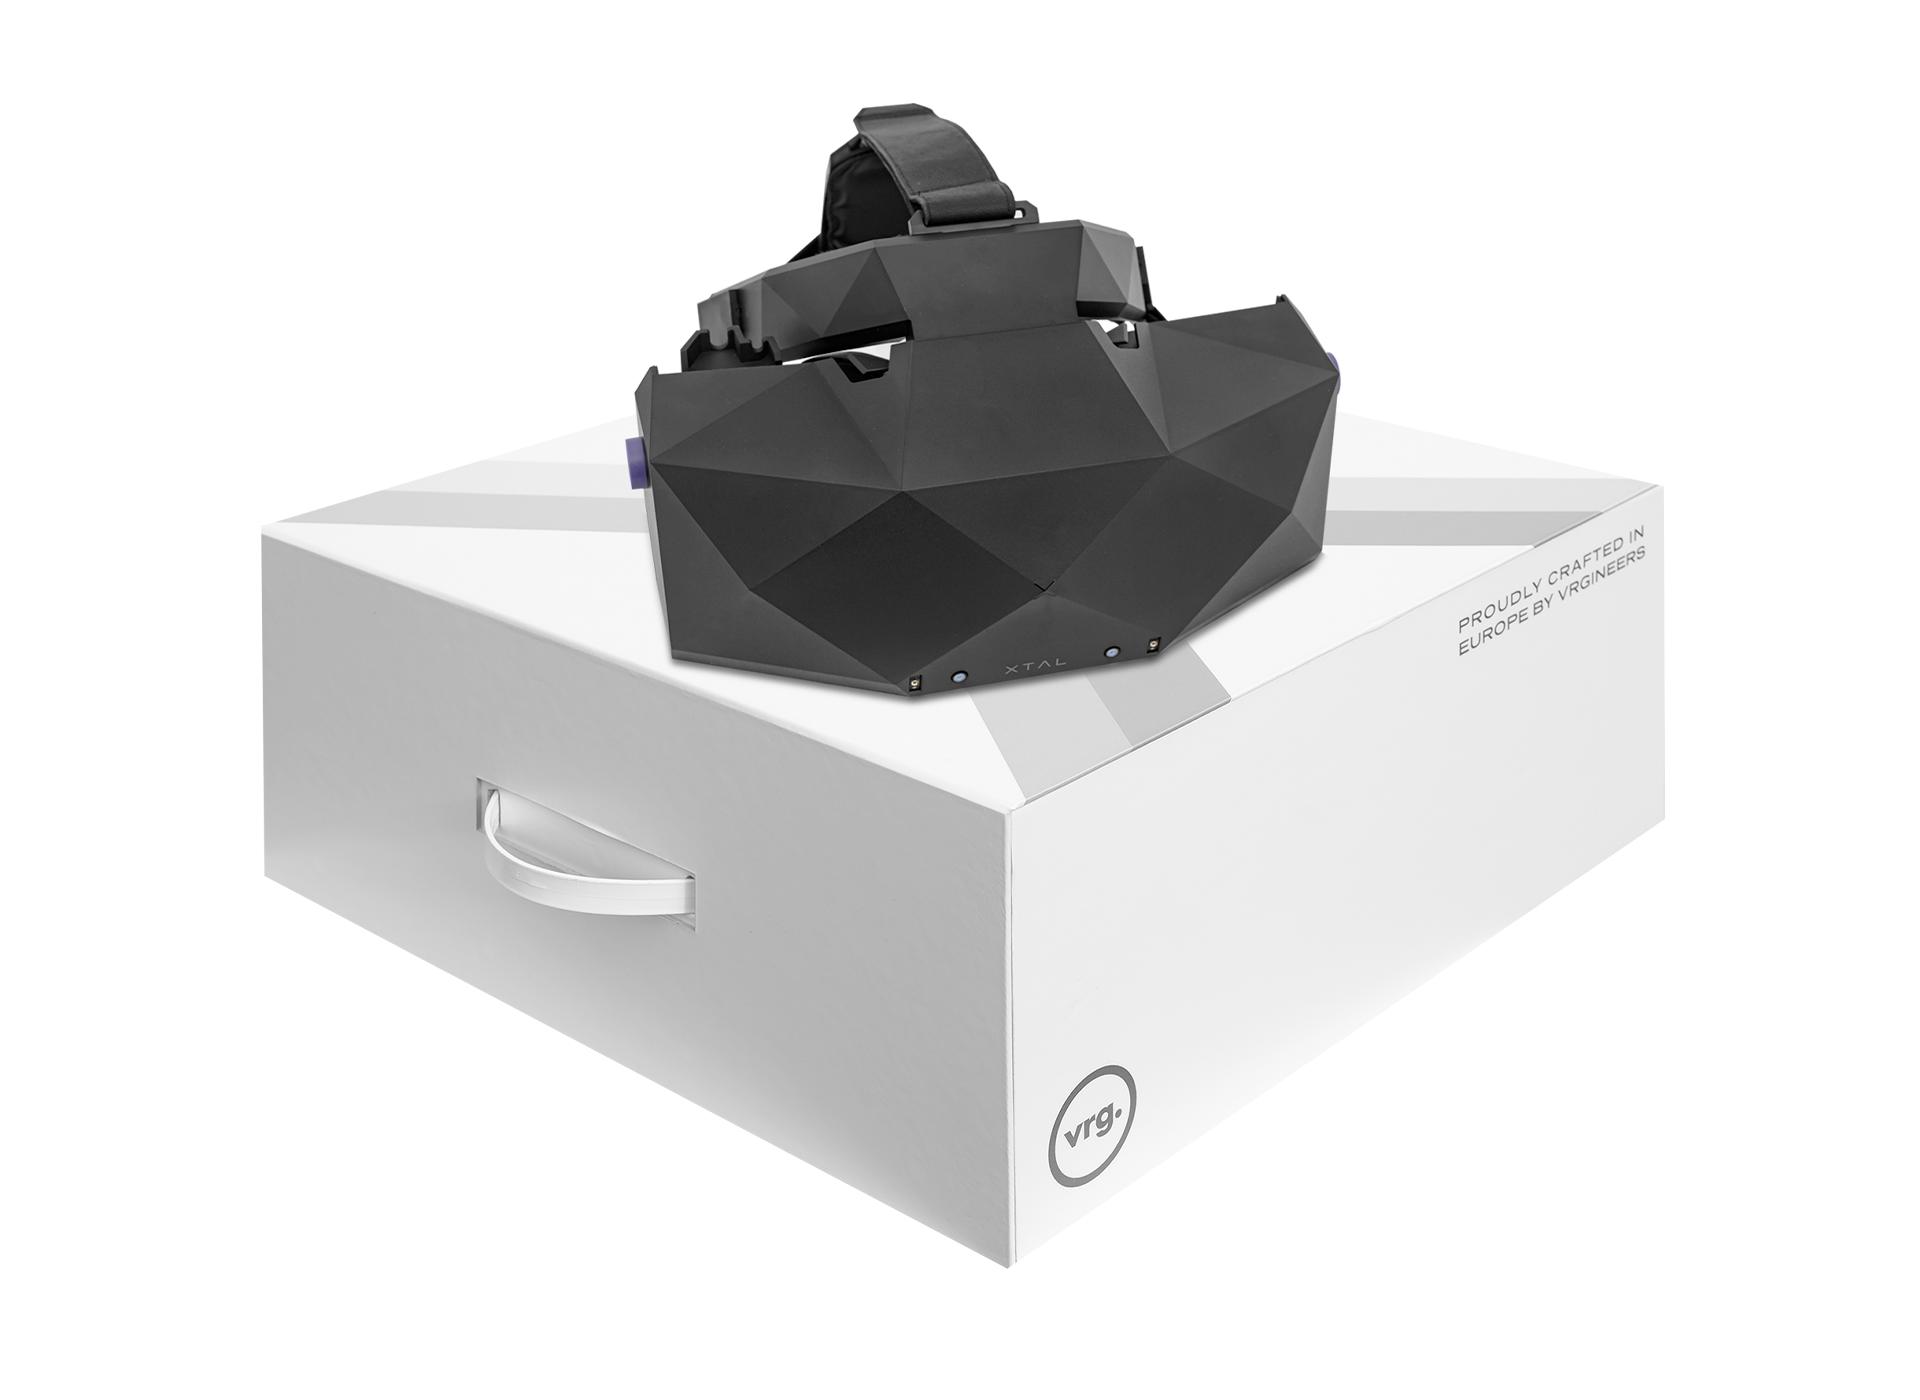 XTAL 5K high-end VR headset packaging box